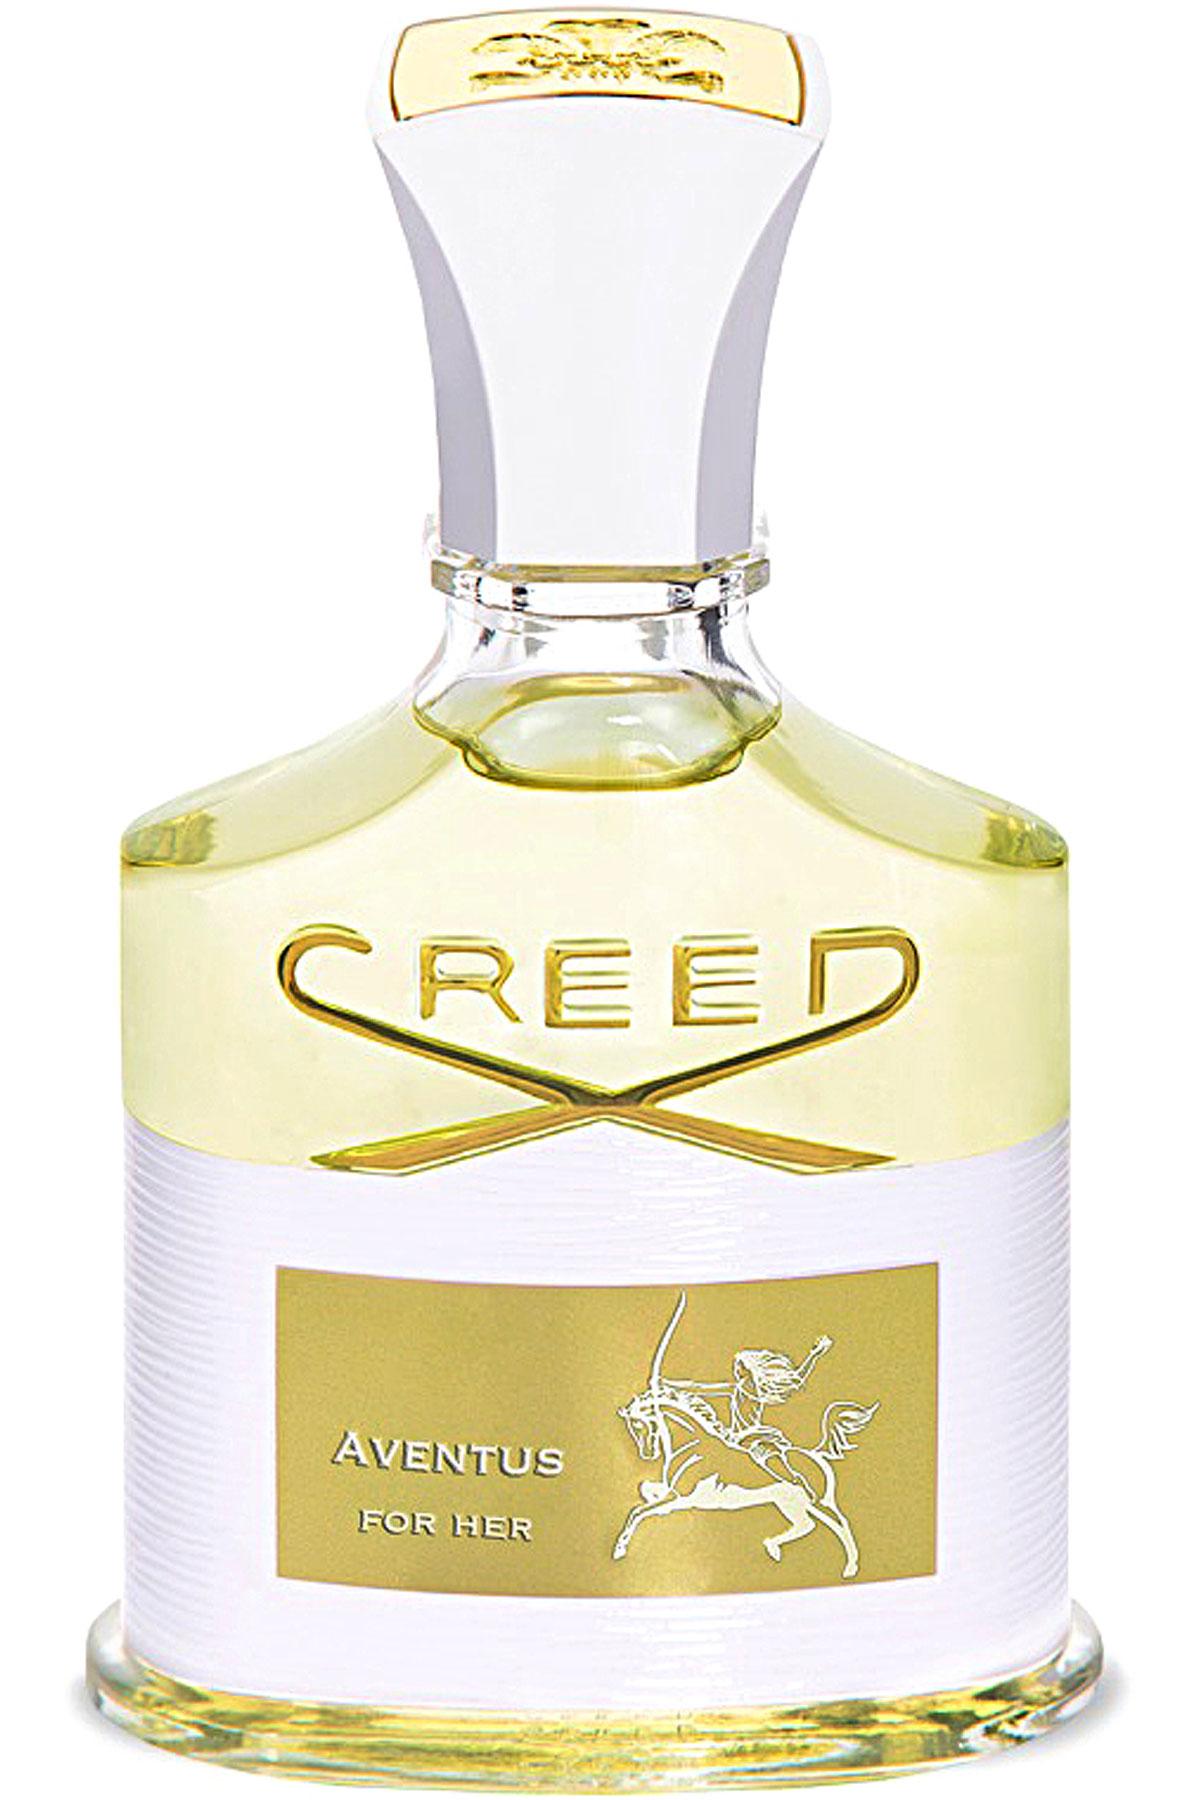 Creed Fragrances for Women, Aventus For Her - Eau De Parfum - 75 Ml, 2019, 75 ml